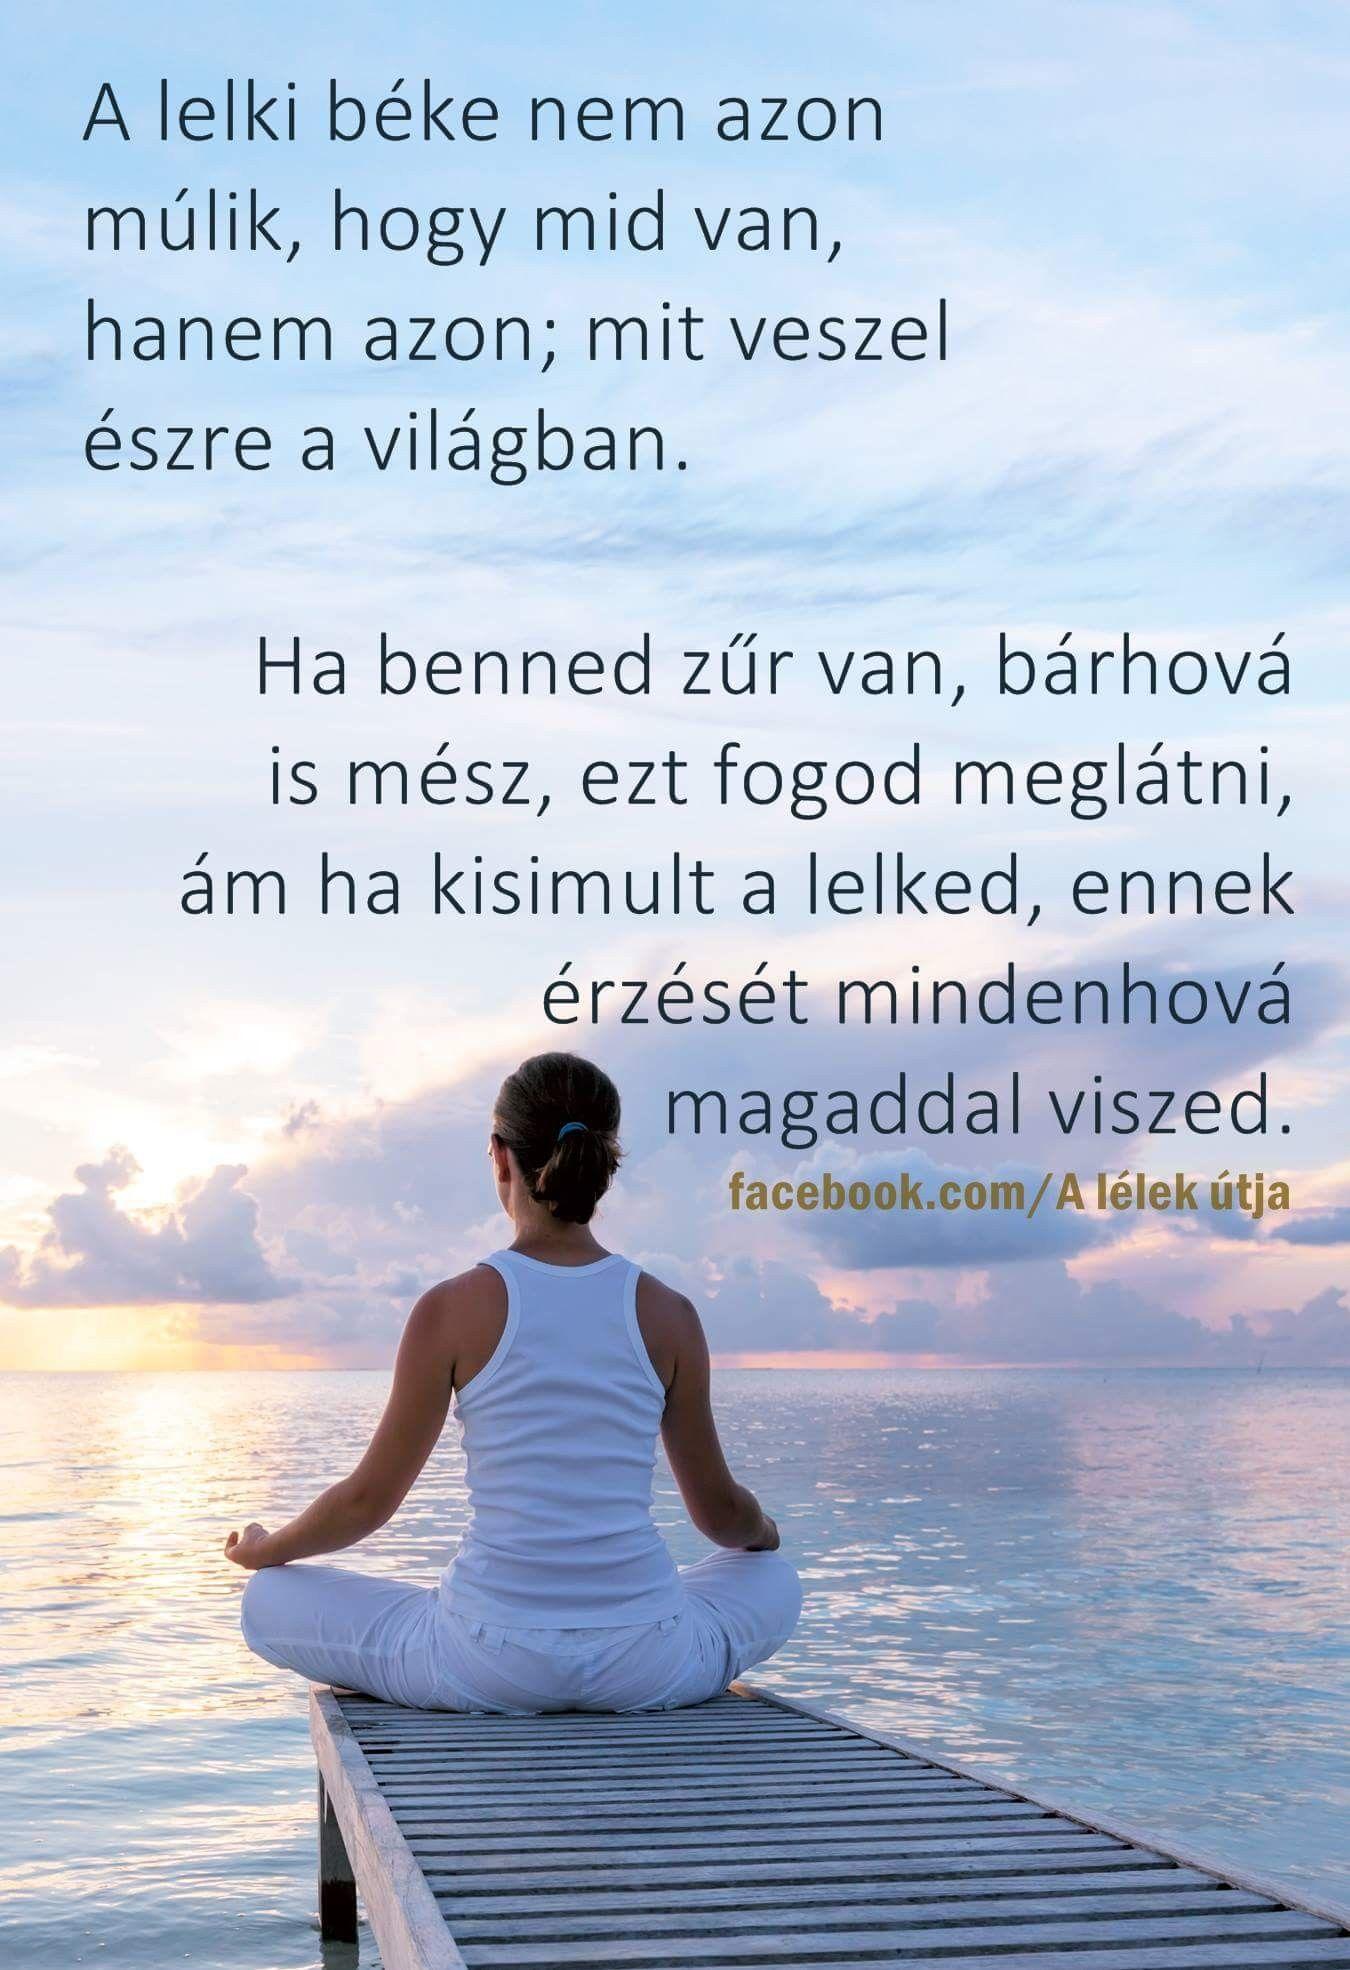 lelki egészség idézetek A lelki béke♡ | Inspirational quotes, Picture quotes